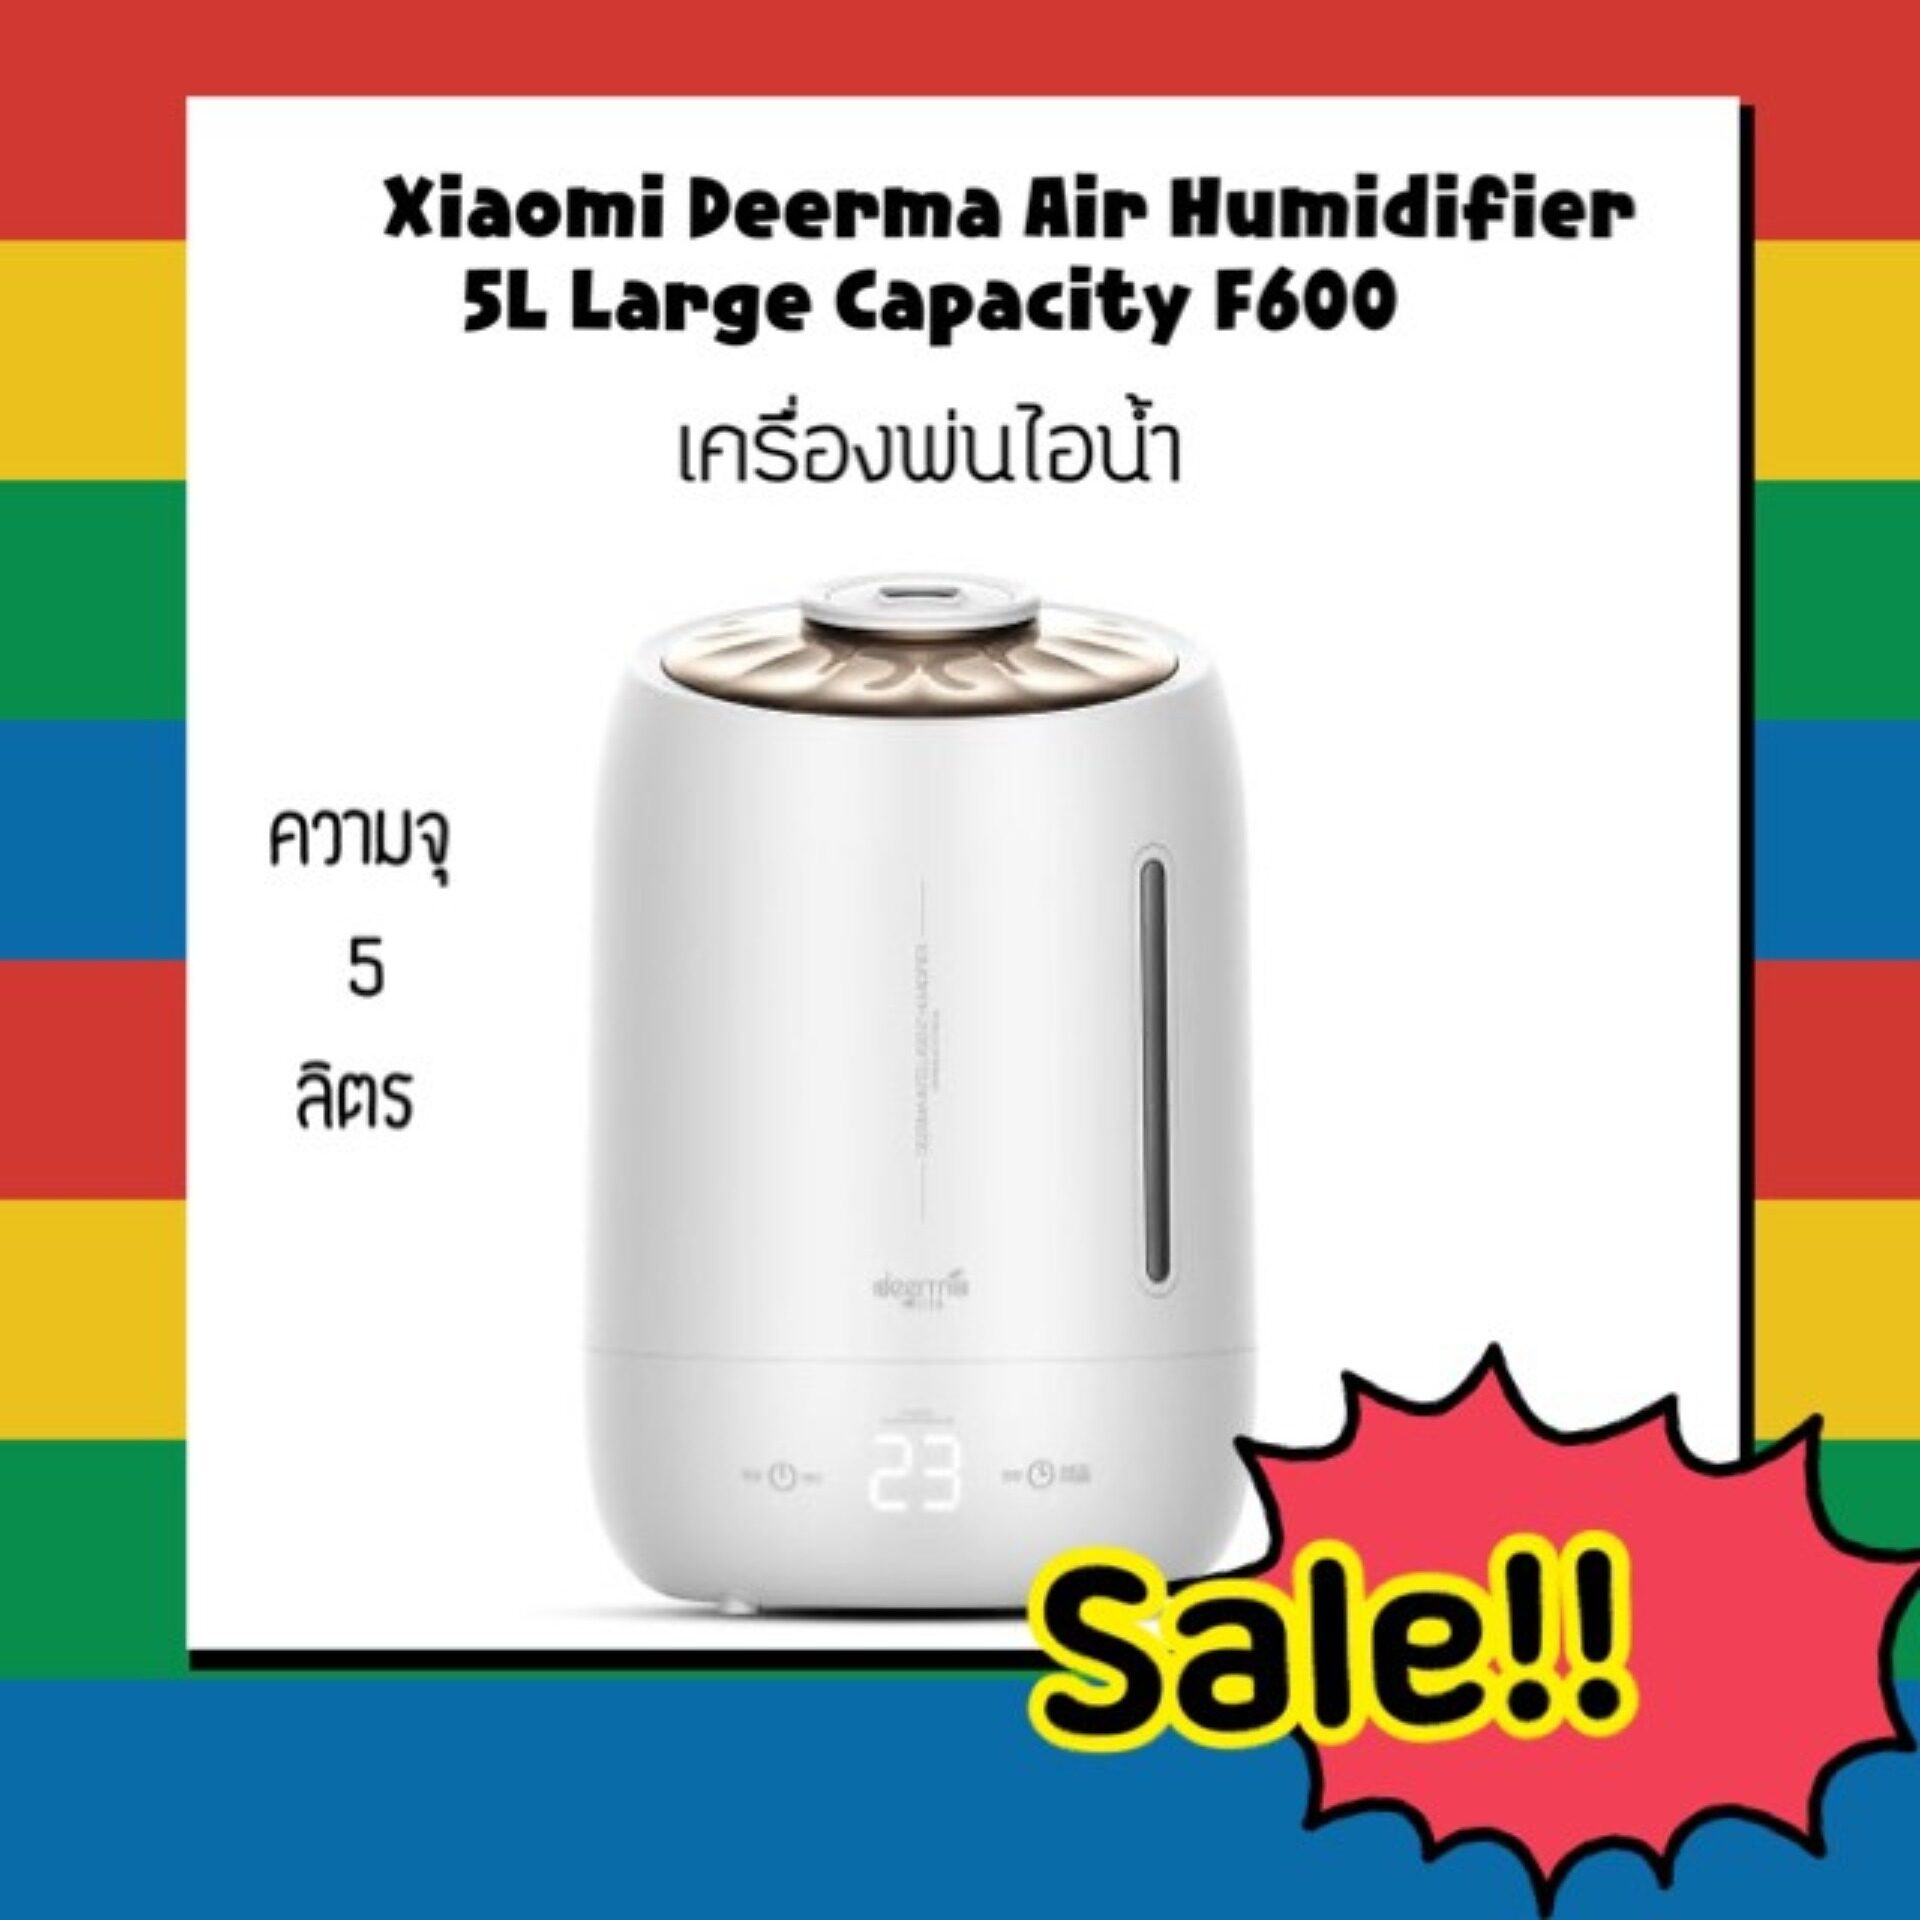 Xiaomi Deerma Air Humidifier 5l Large Capacity F600 เครื่องพ่นไอน้ำเพิ่มความชื้นในห้องที่มีเครื่องปรับอากาศได้อย่างมีประสิทธิภาพ.